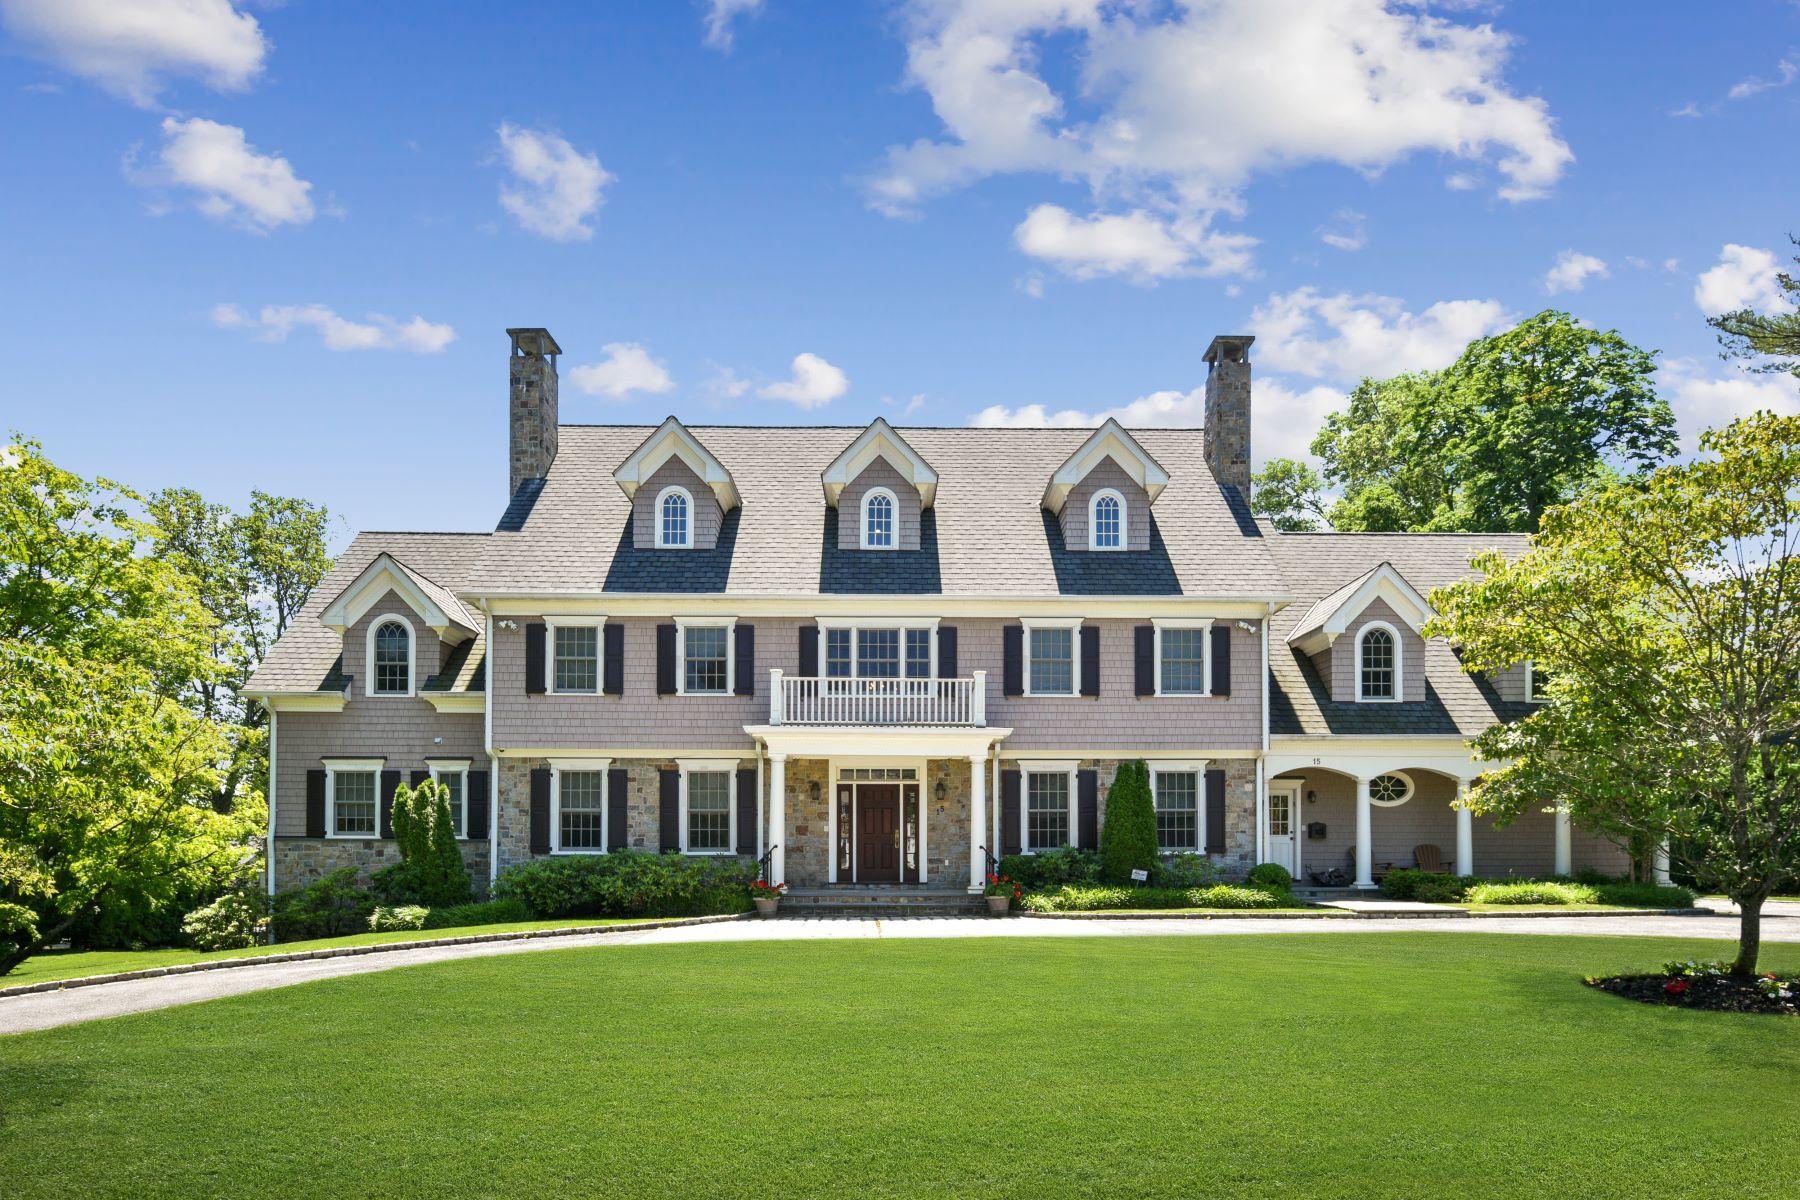 Single Family Homes för Försäljning vid Live like a Celebrity in this Contemporary Colonial 15 Wiltshire Road, Scarsdale, New York 10583 Förenta staterna